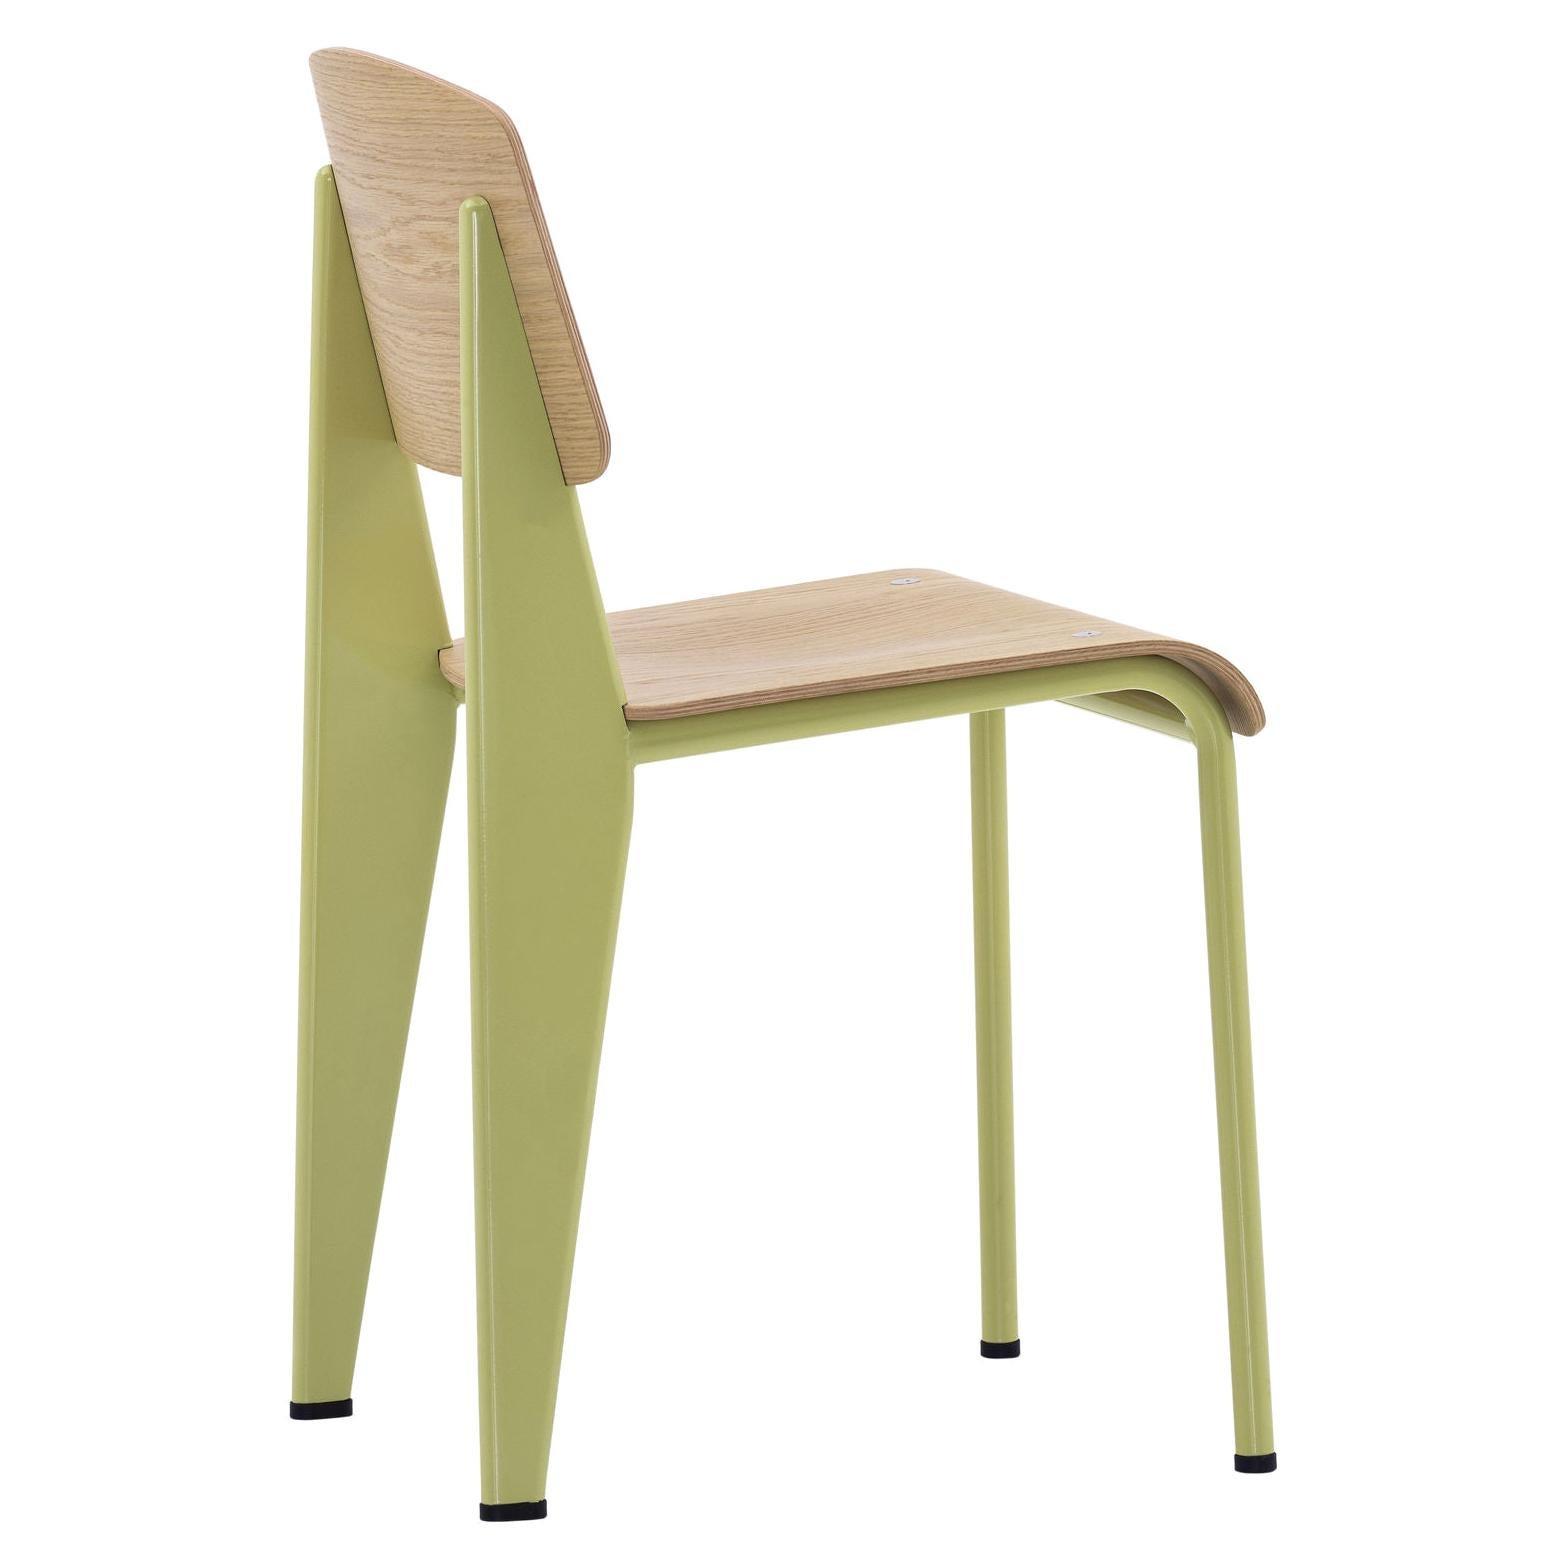 Jean Prouvé Standard Chair by Vitra